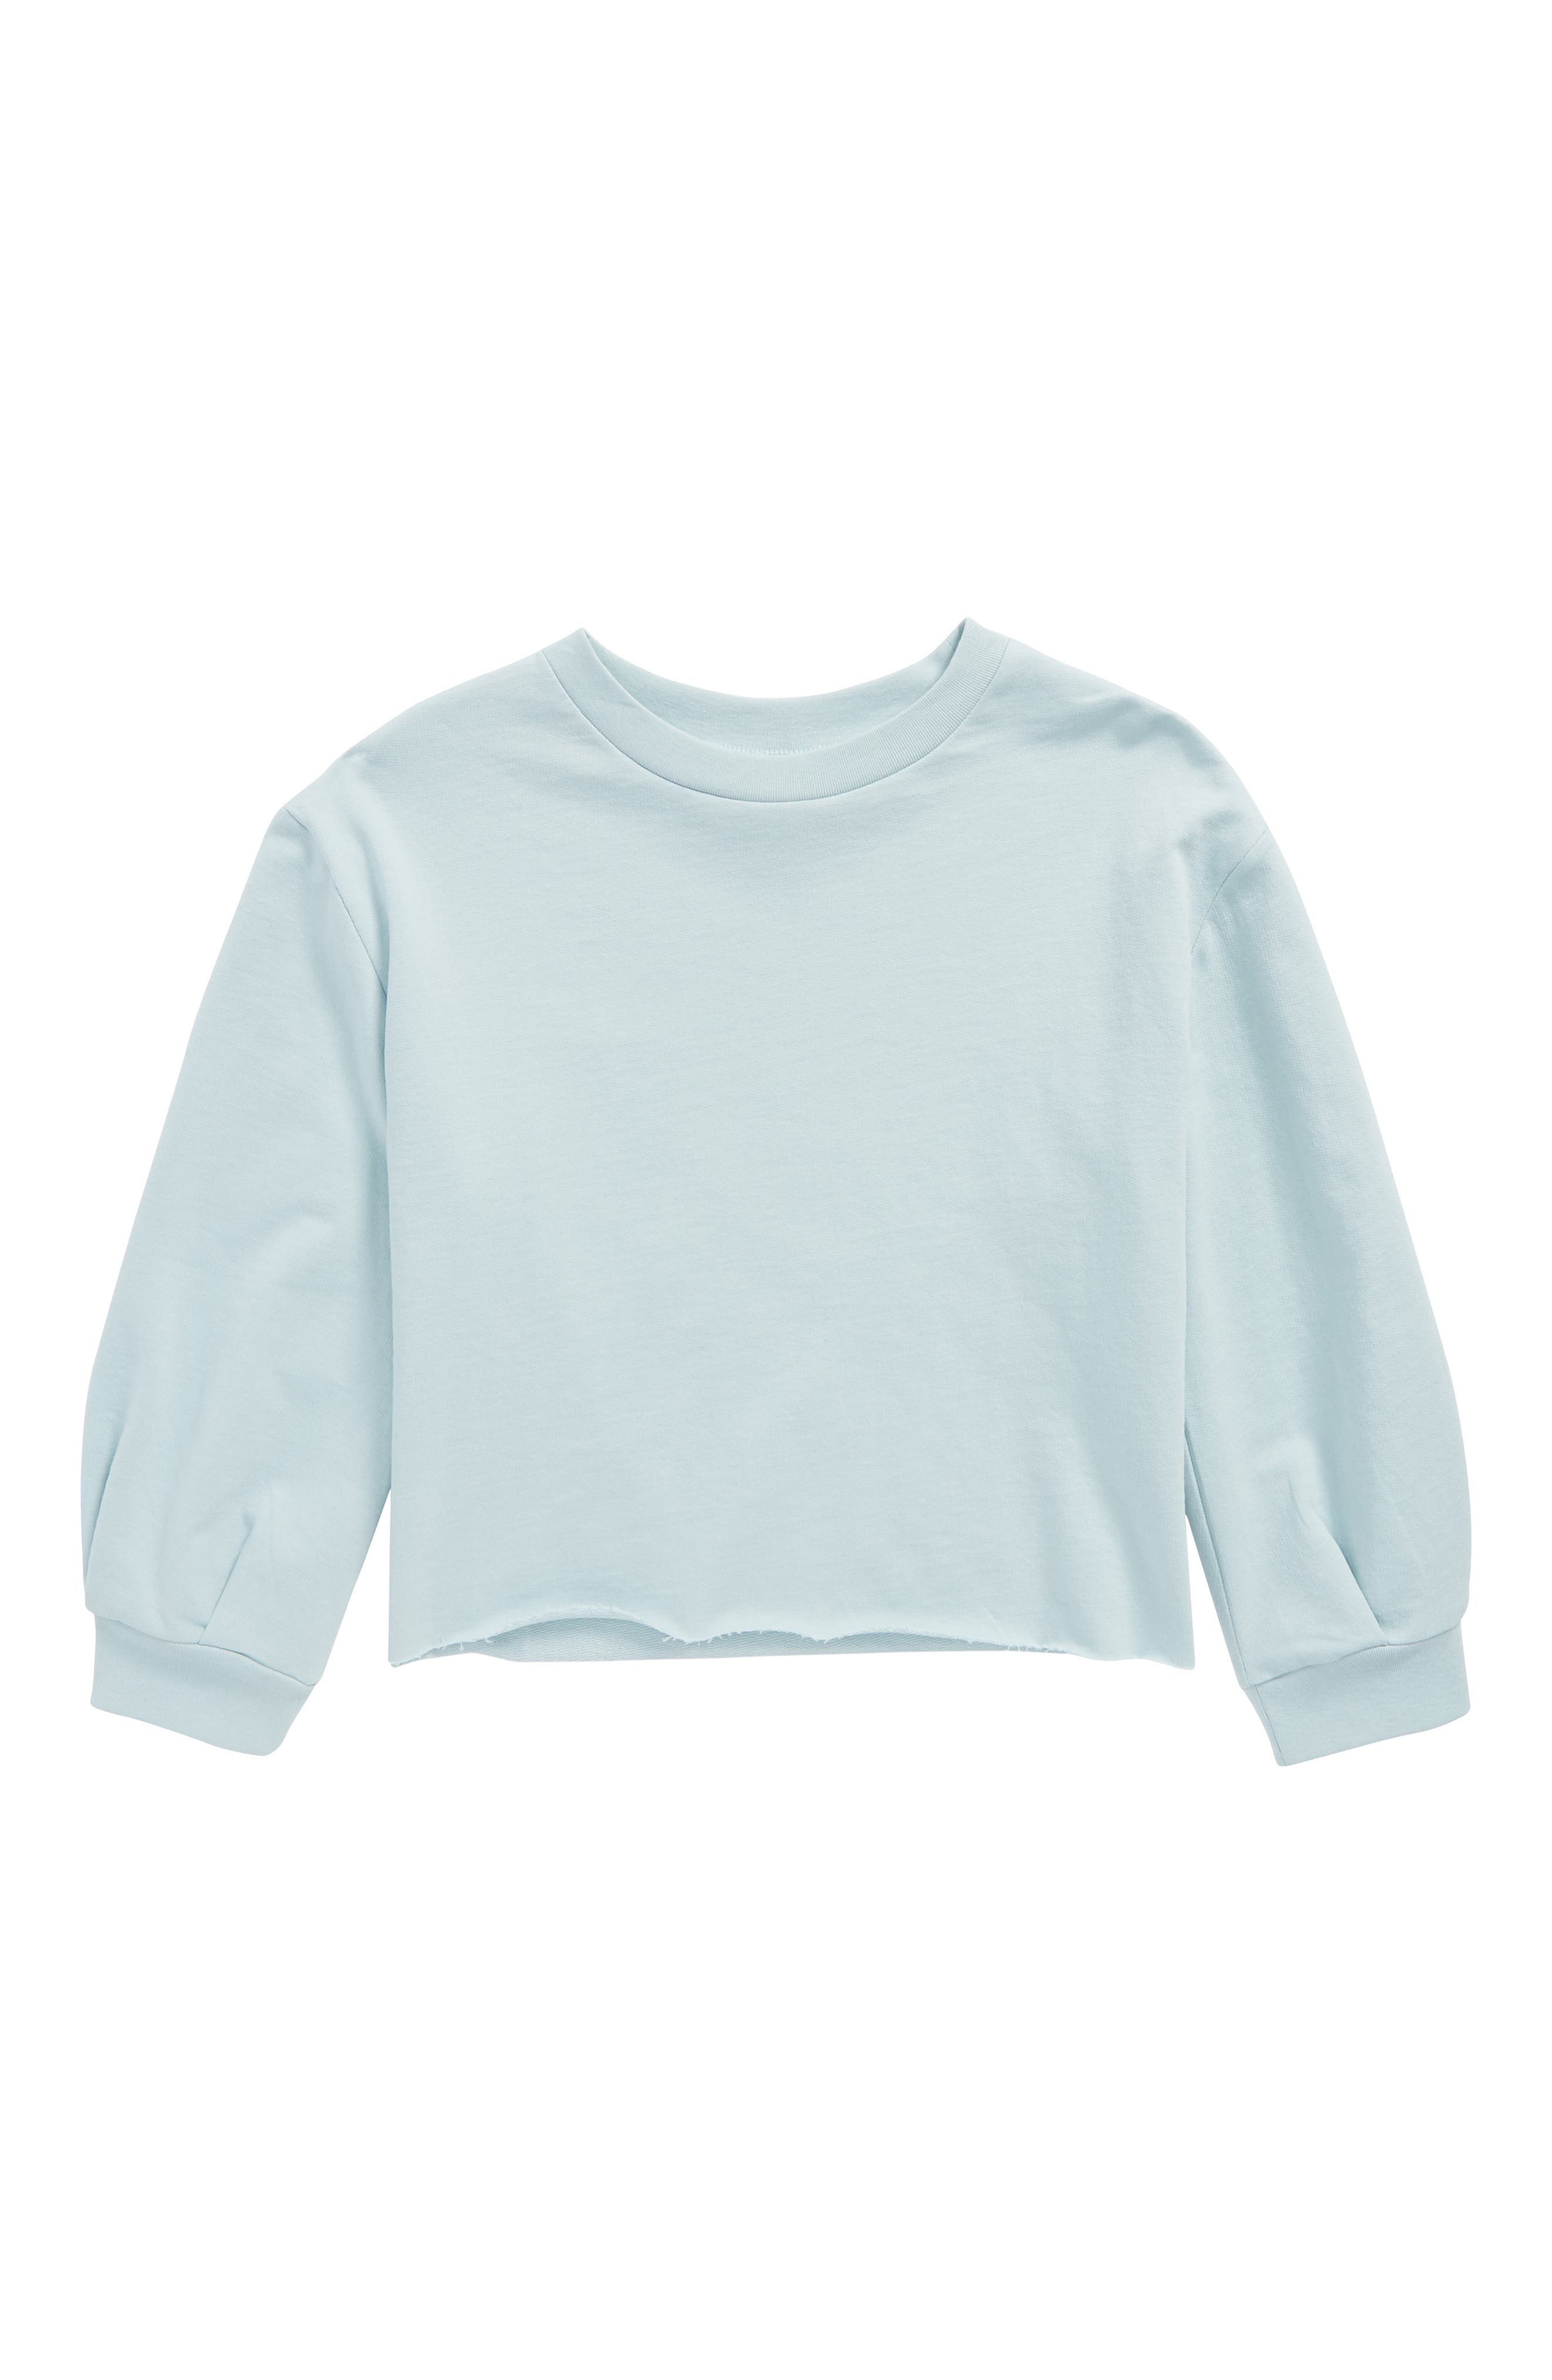 Raw Edge Sweatshirt,                         Main,                         color,